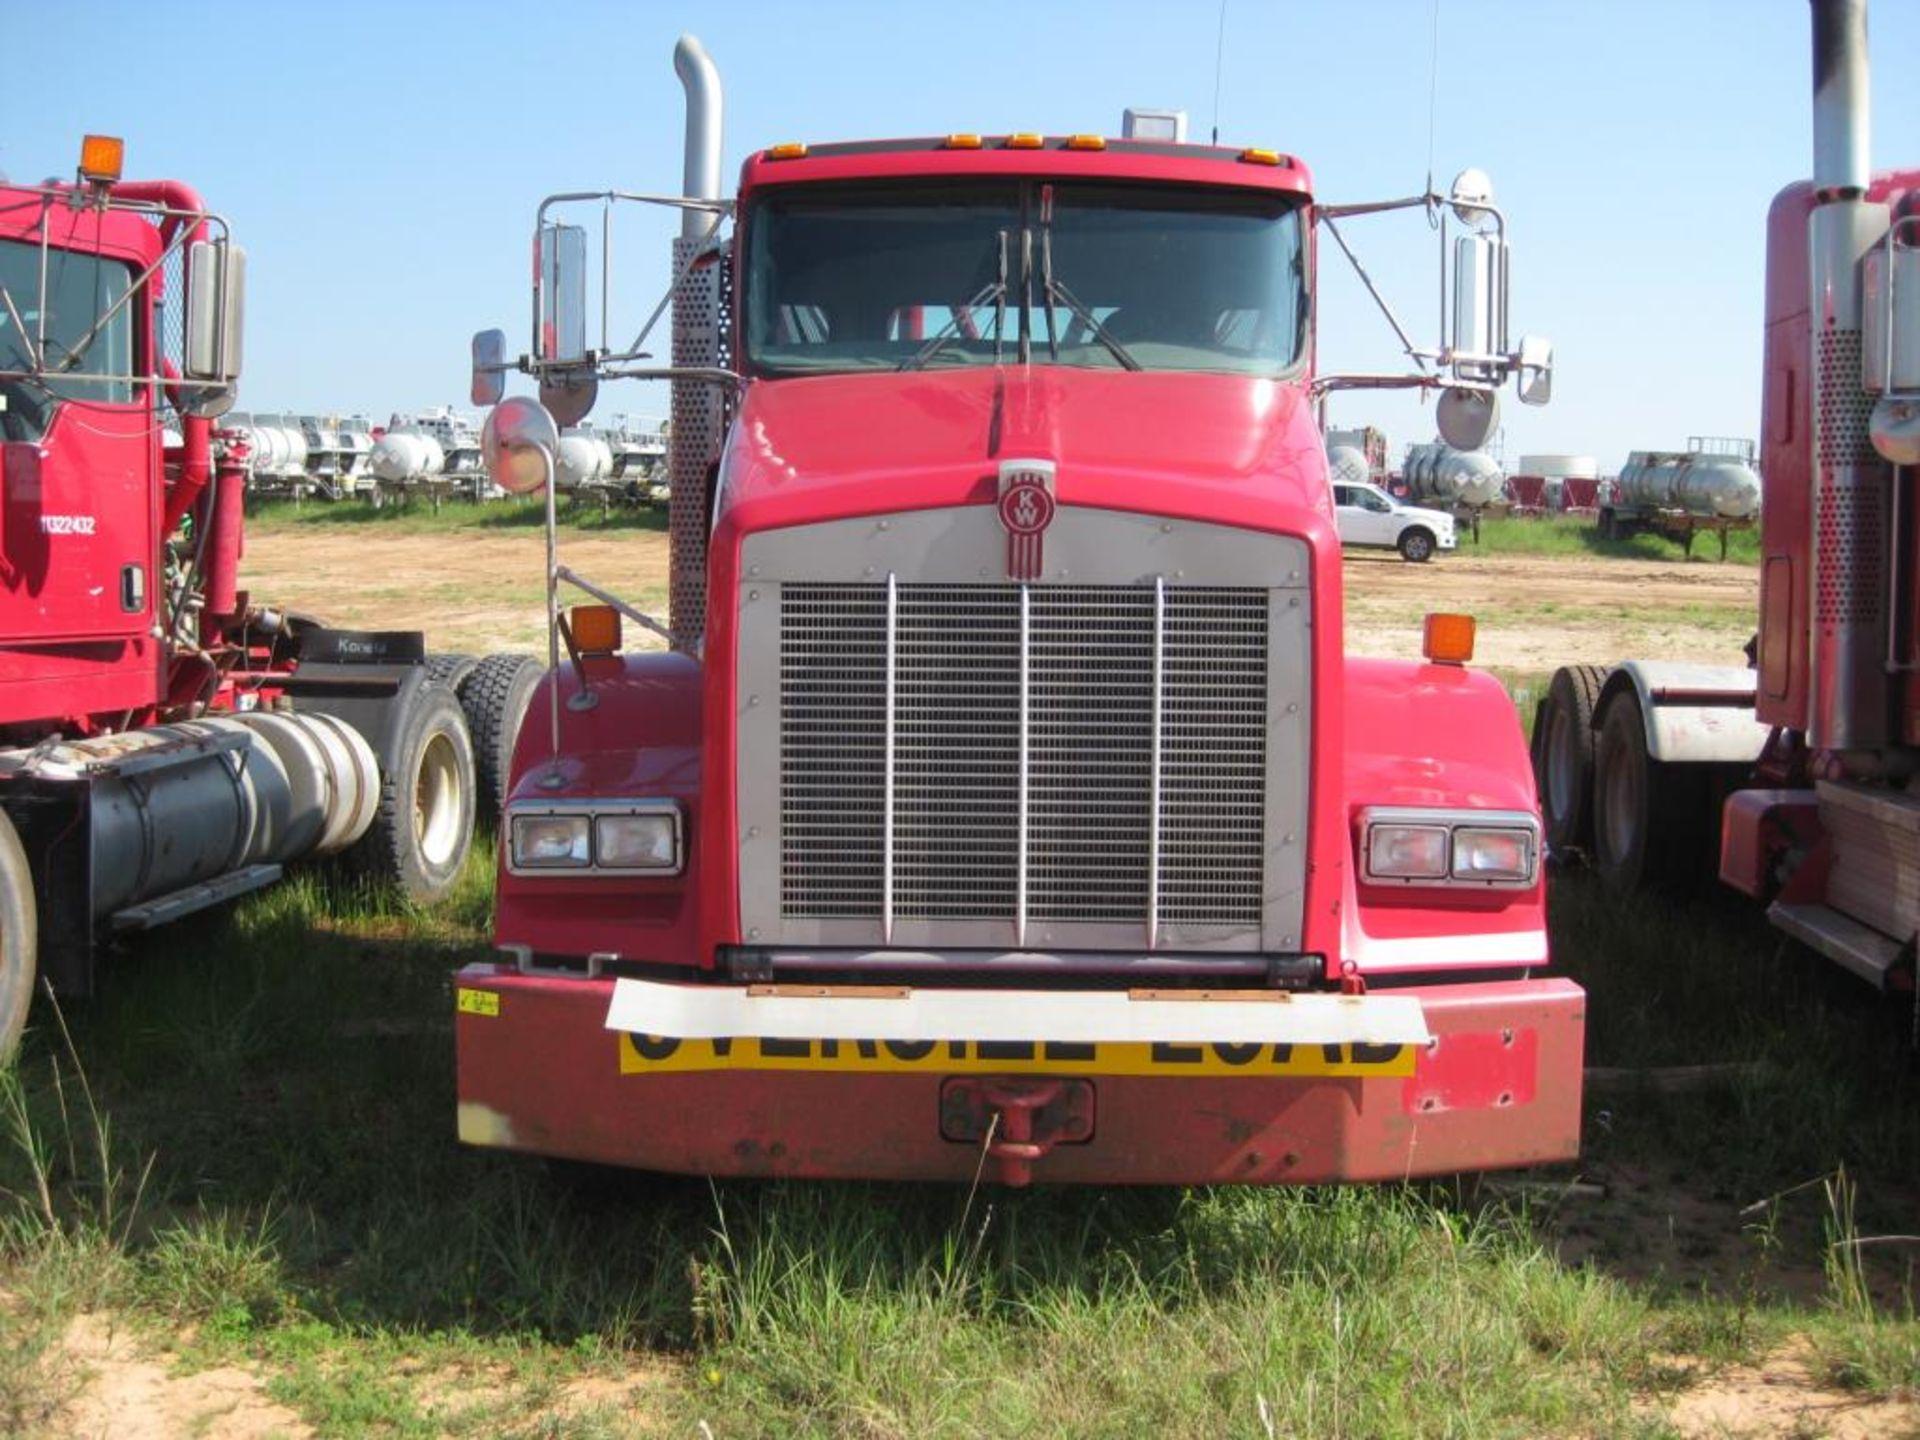 Kenworth Winch Truck - Image 3 of 25